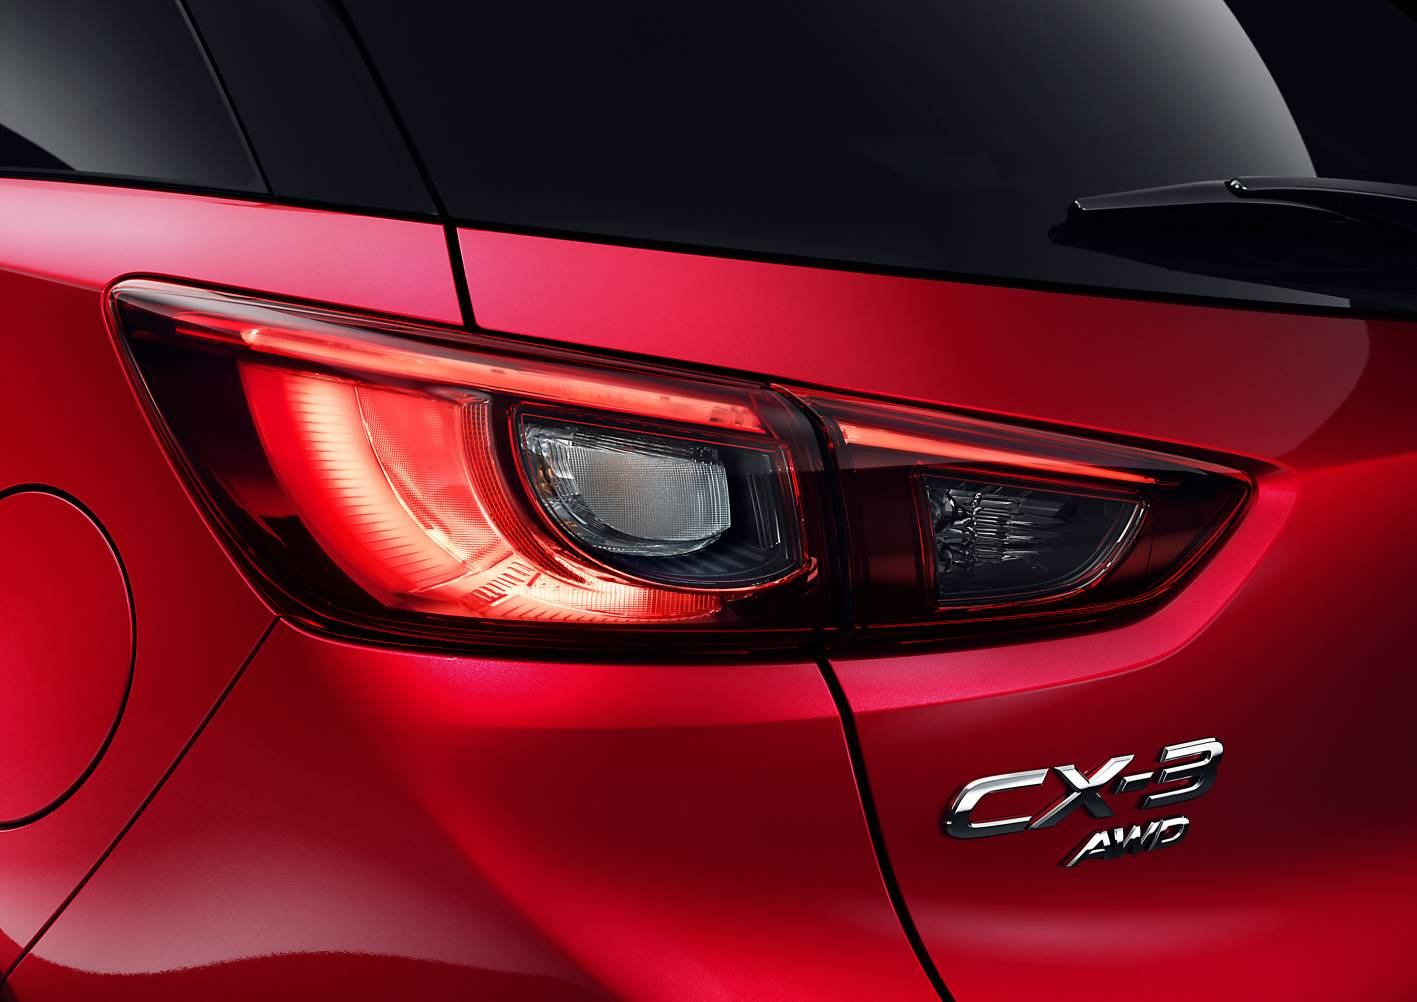 Mazda Cars - News: Mazda CX-3 leaked ahead of LA Show debut